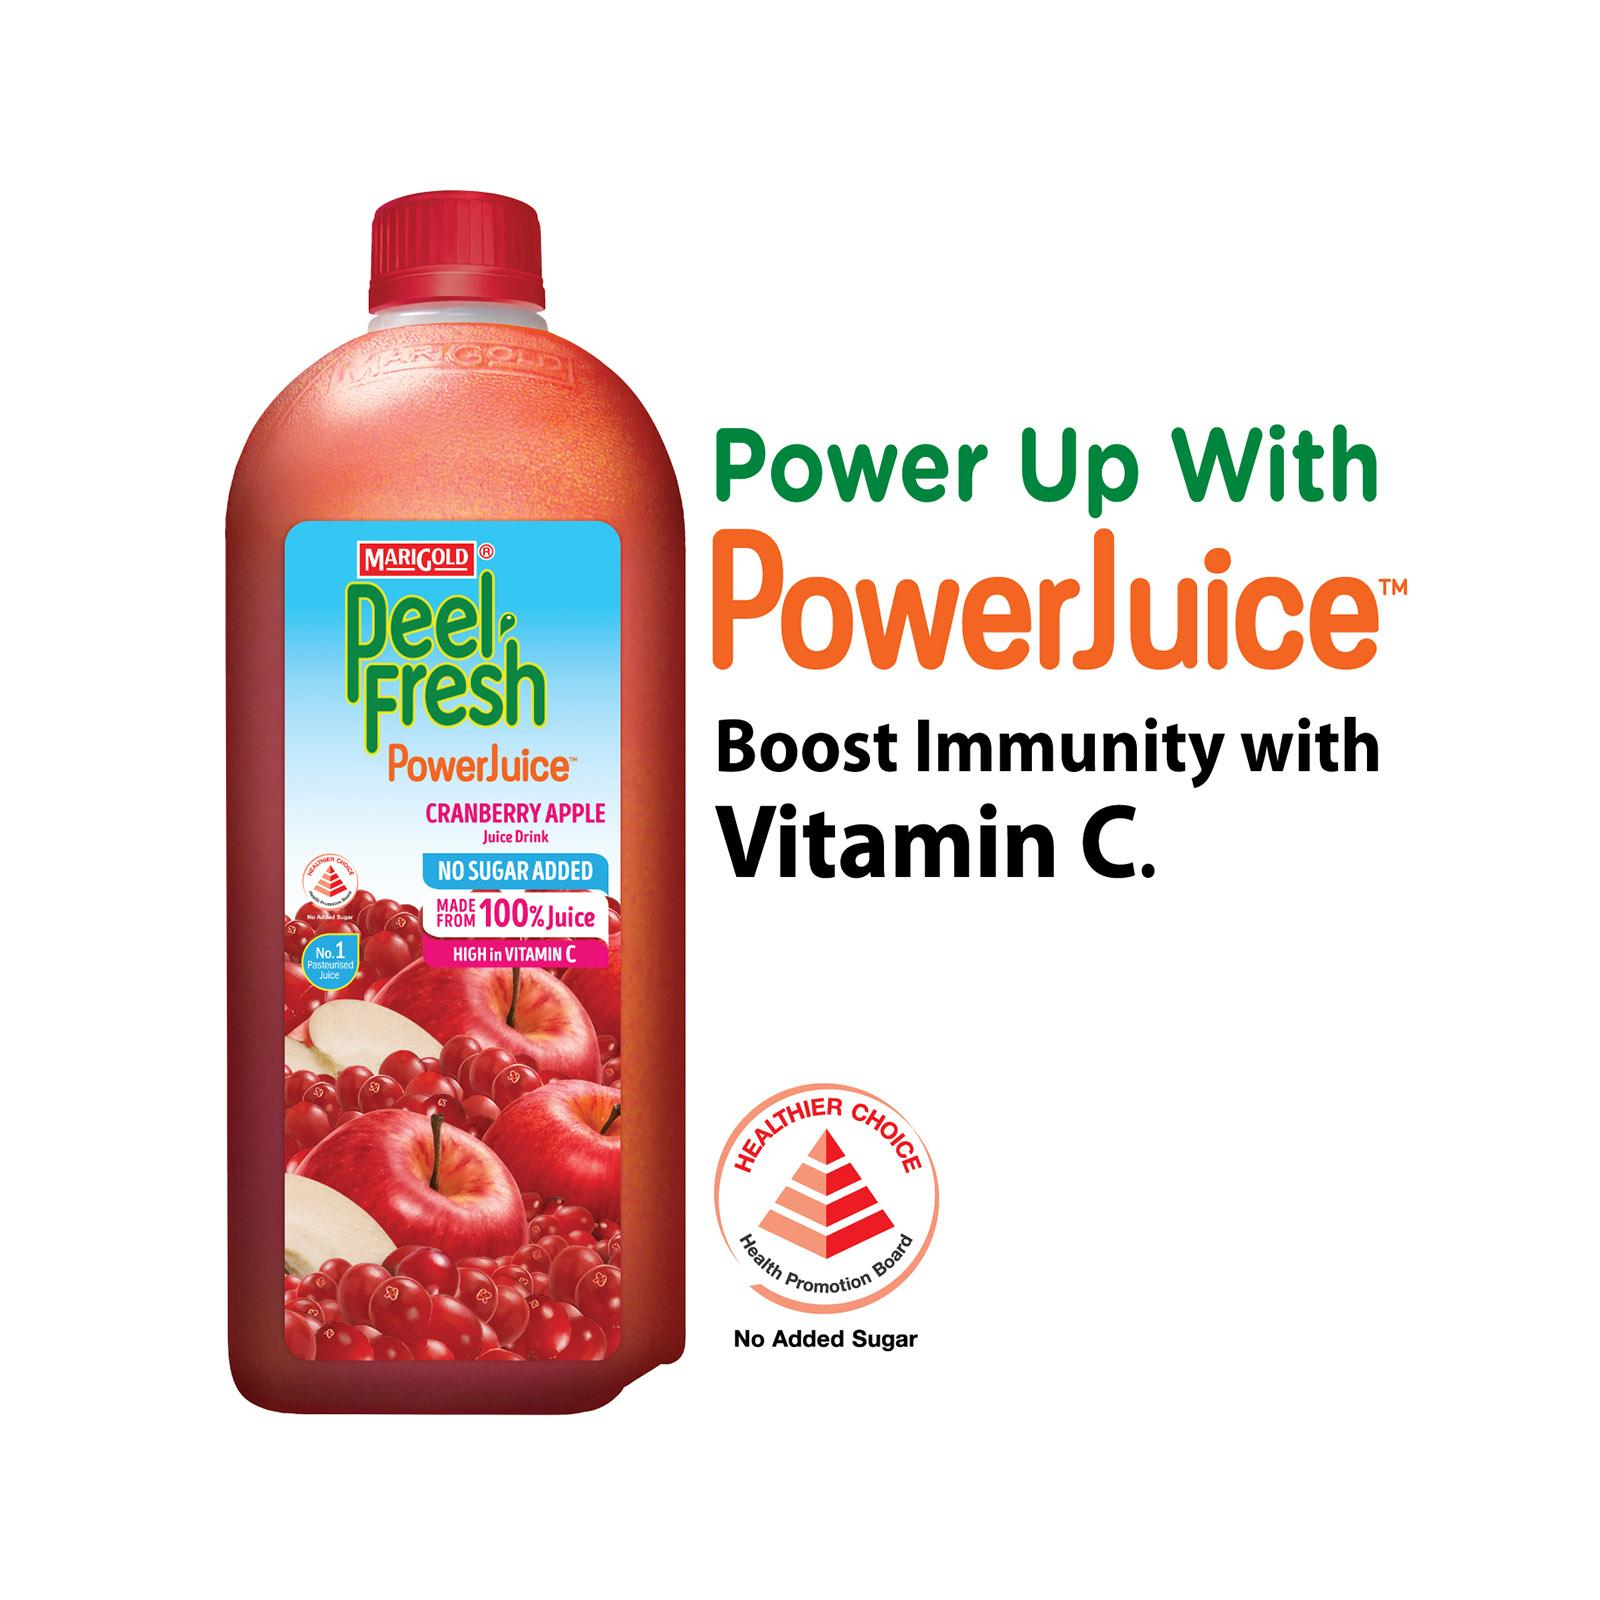 MARIGOLD PEEL FRESH Cranberry Mixed Apple Juice Drink - No Sugar Added 2L